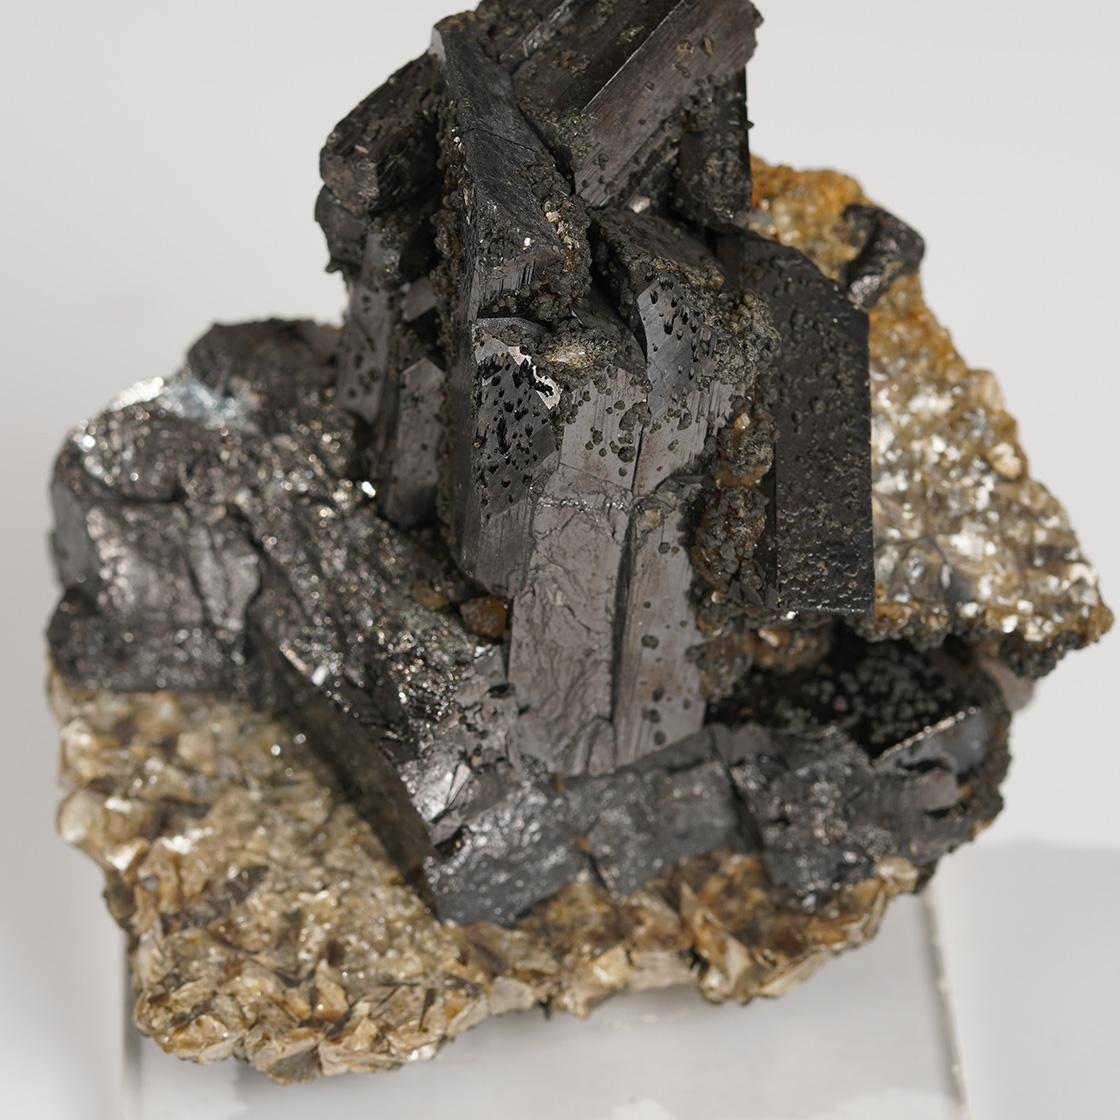 Ferberite